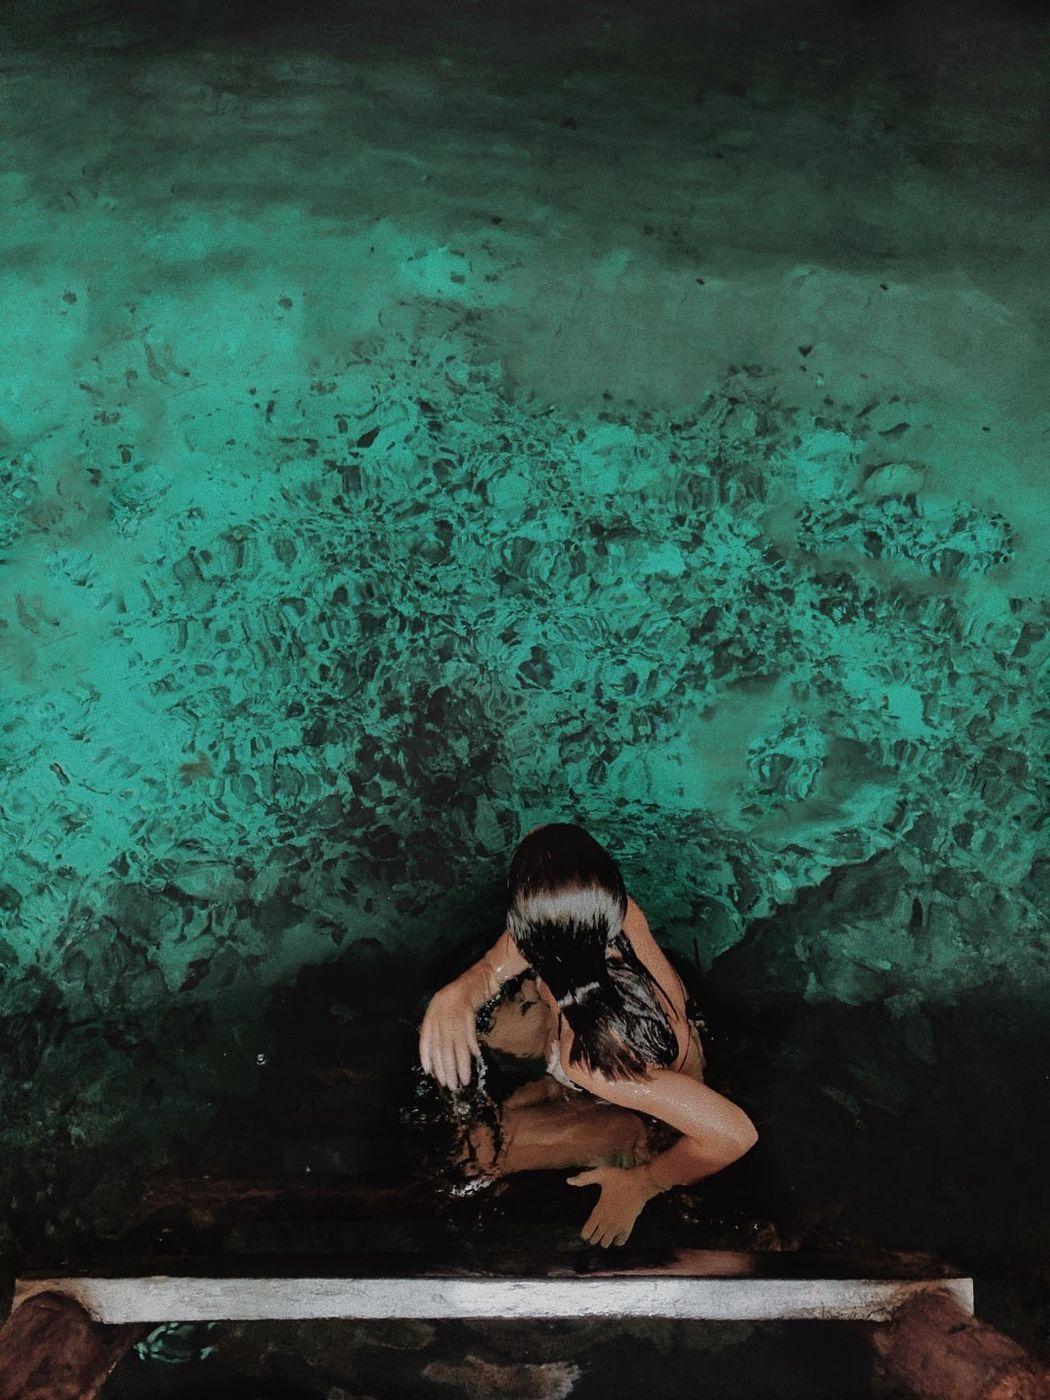 "Photo by <a href=""https://unsplash.com/@mathildelangevin?utm_source=magma&utm_medium=referral"">Mathilde Langevin</a> on <a href=""https://unsplash.com/?utm_source=magma&utm_medium=referral"">Unsplash</a>"